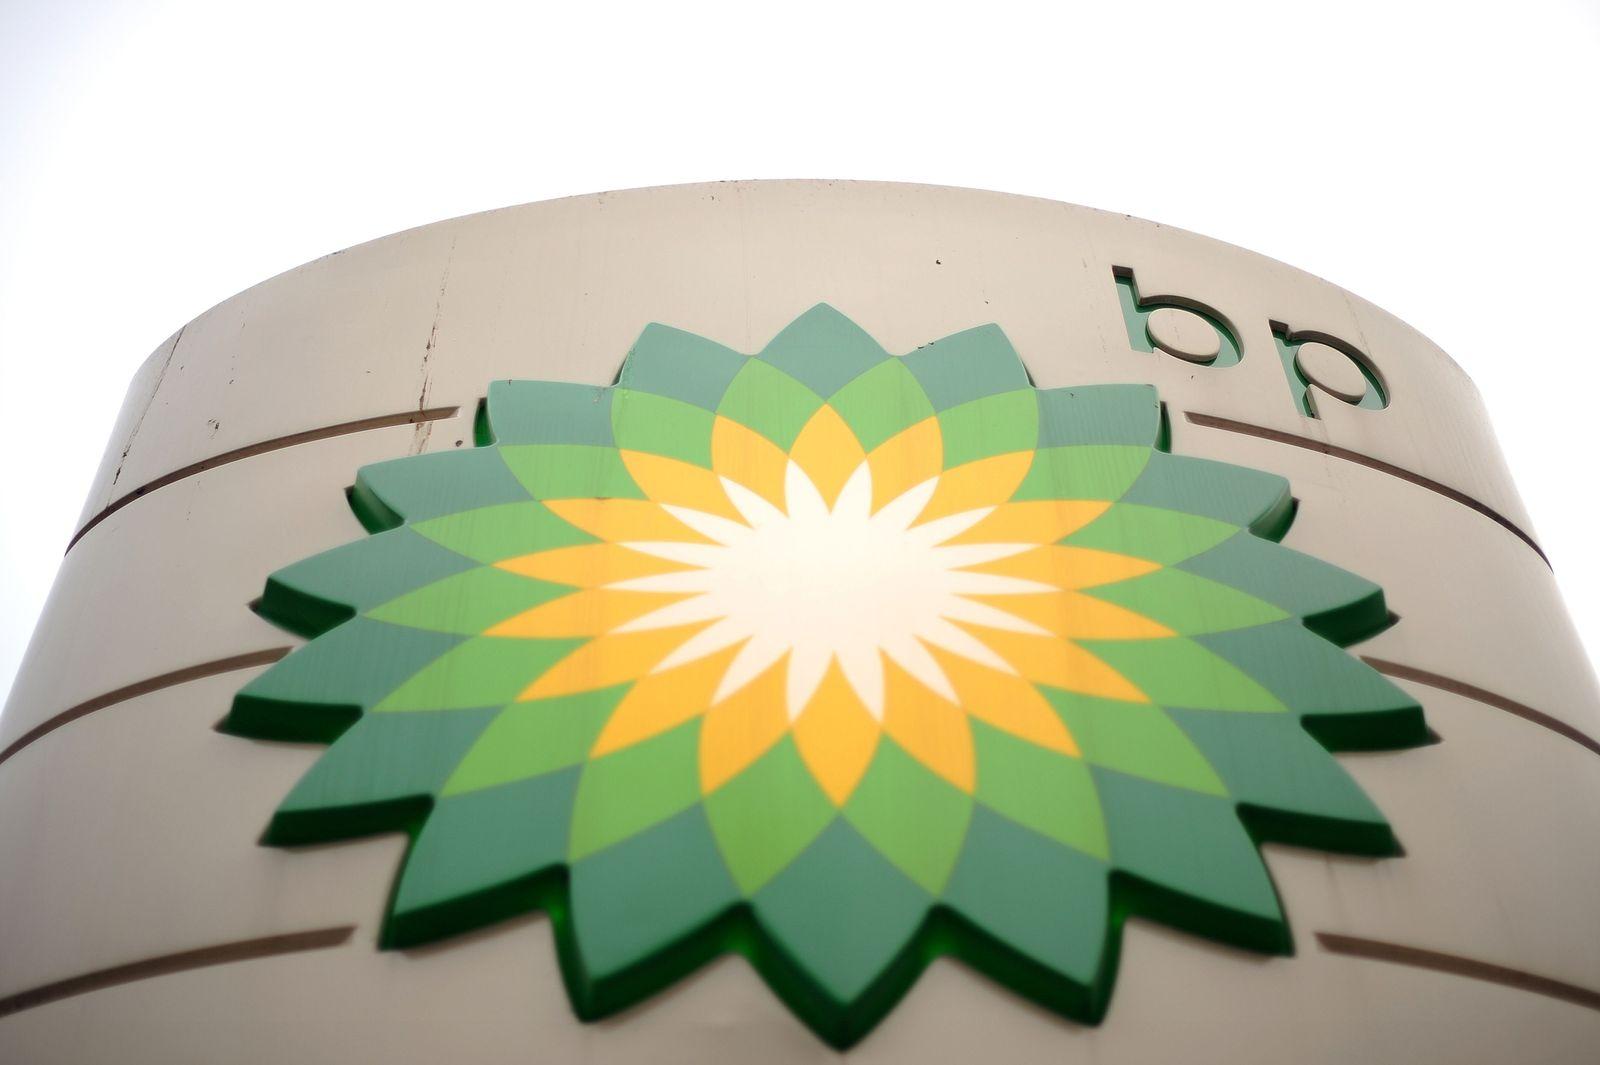 BP / British Petroleum / Tankstelle / Öl / Energie